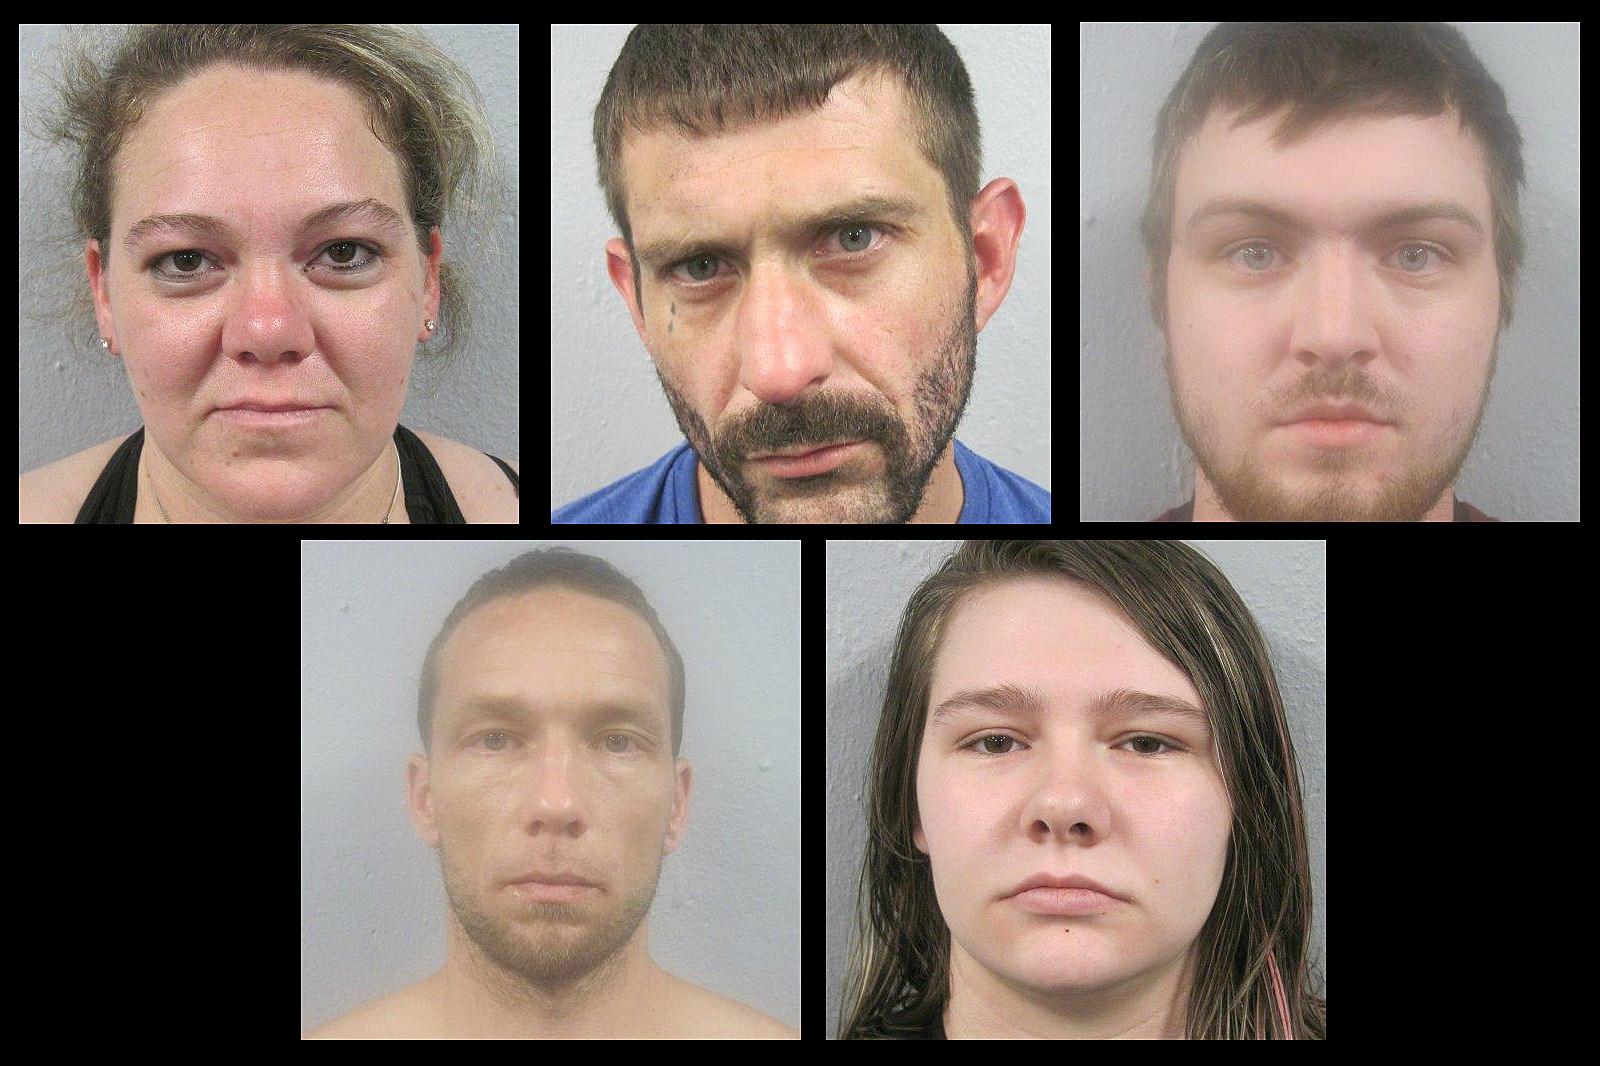 Sedalia Residents Among 37 Indicted for $1 Million Drug-Trafficking